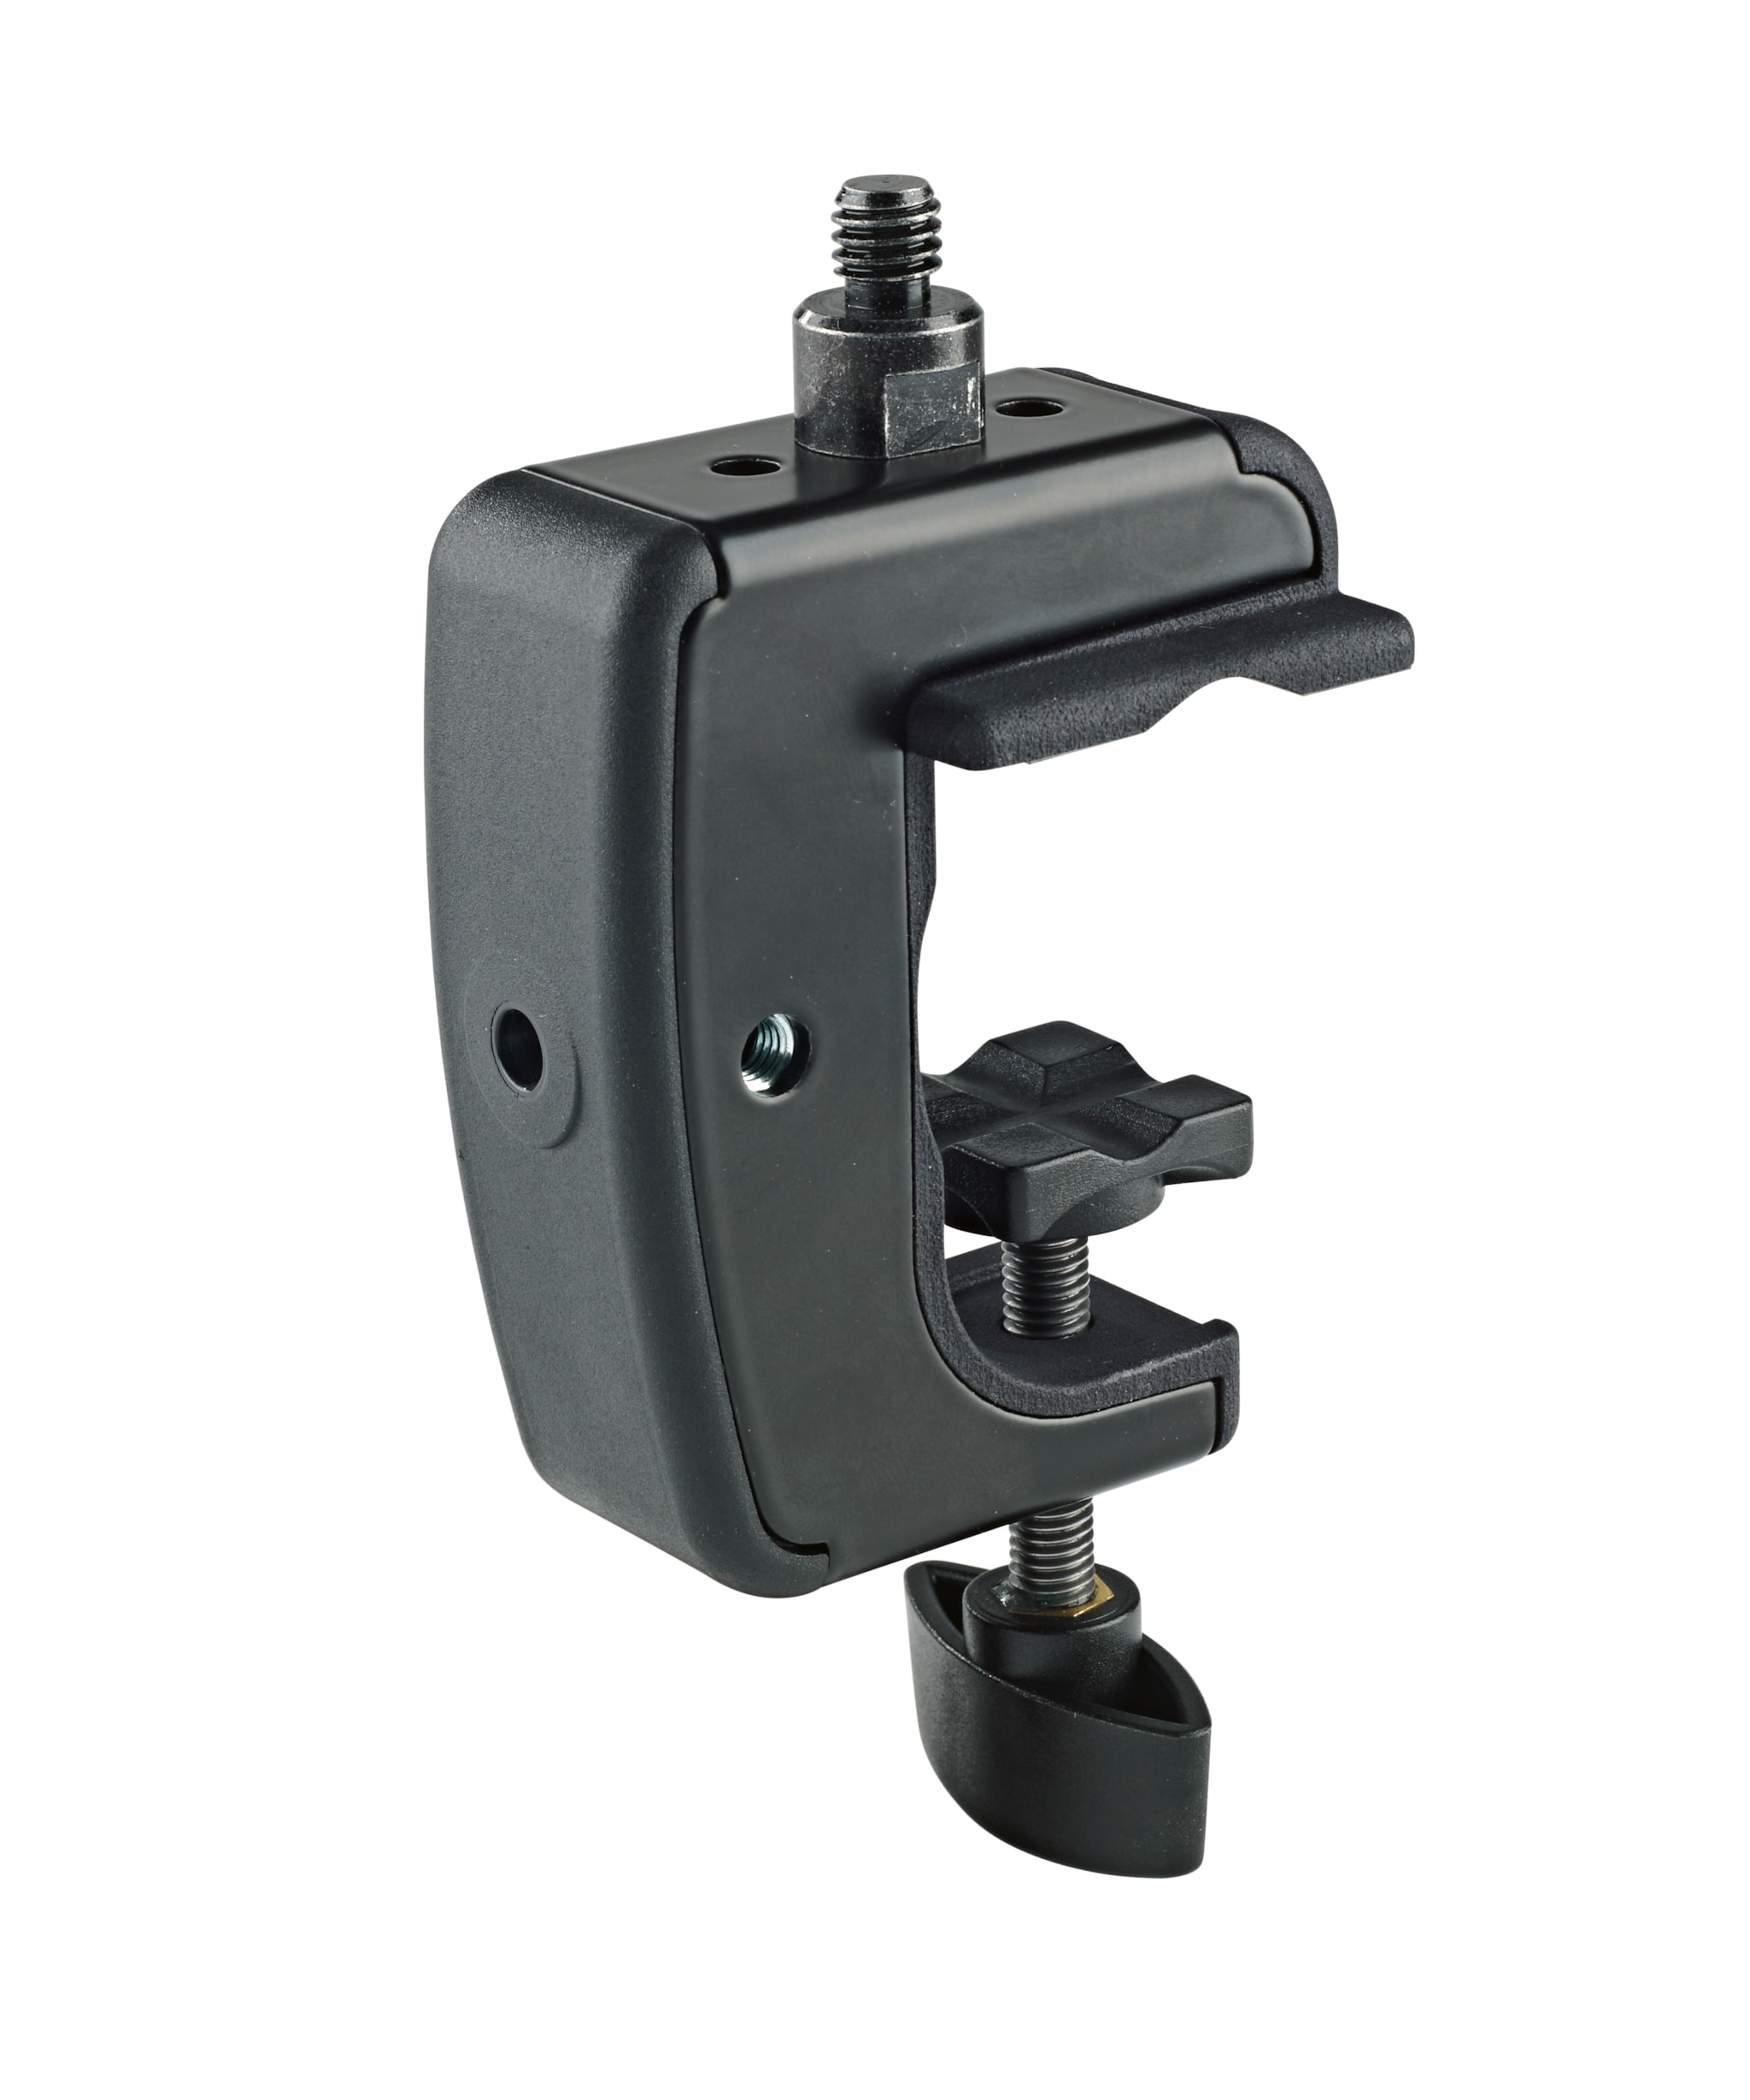 KM23723 - Universal clamp